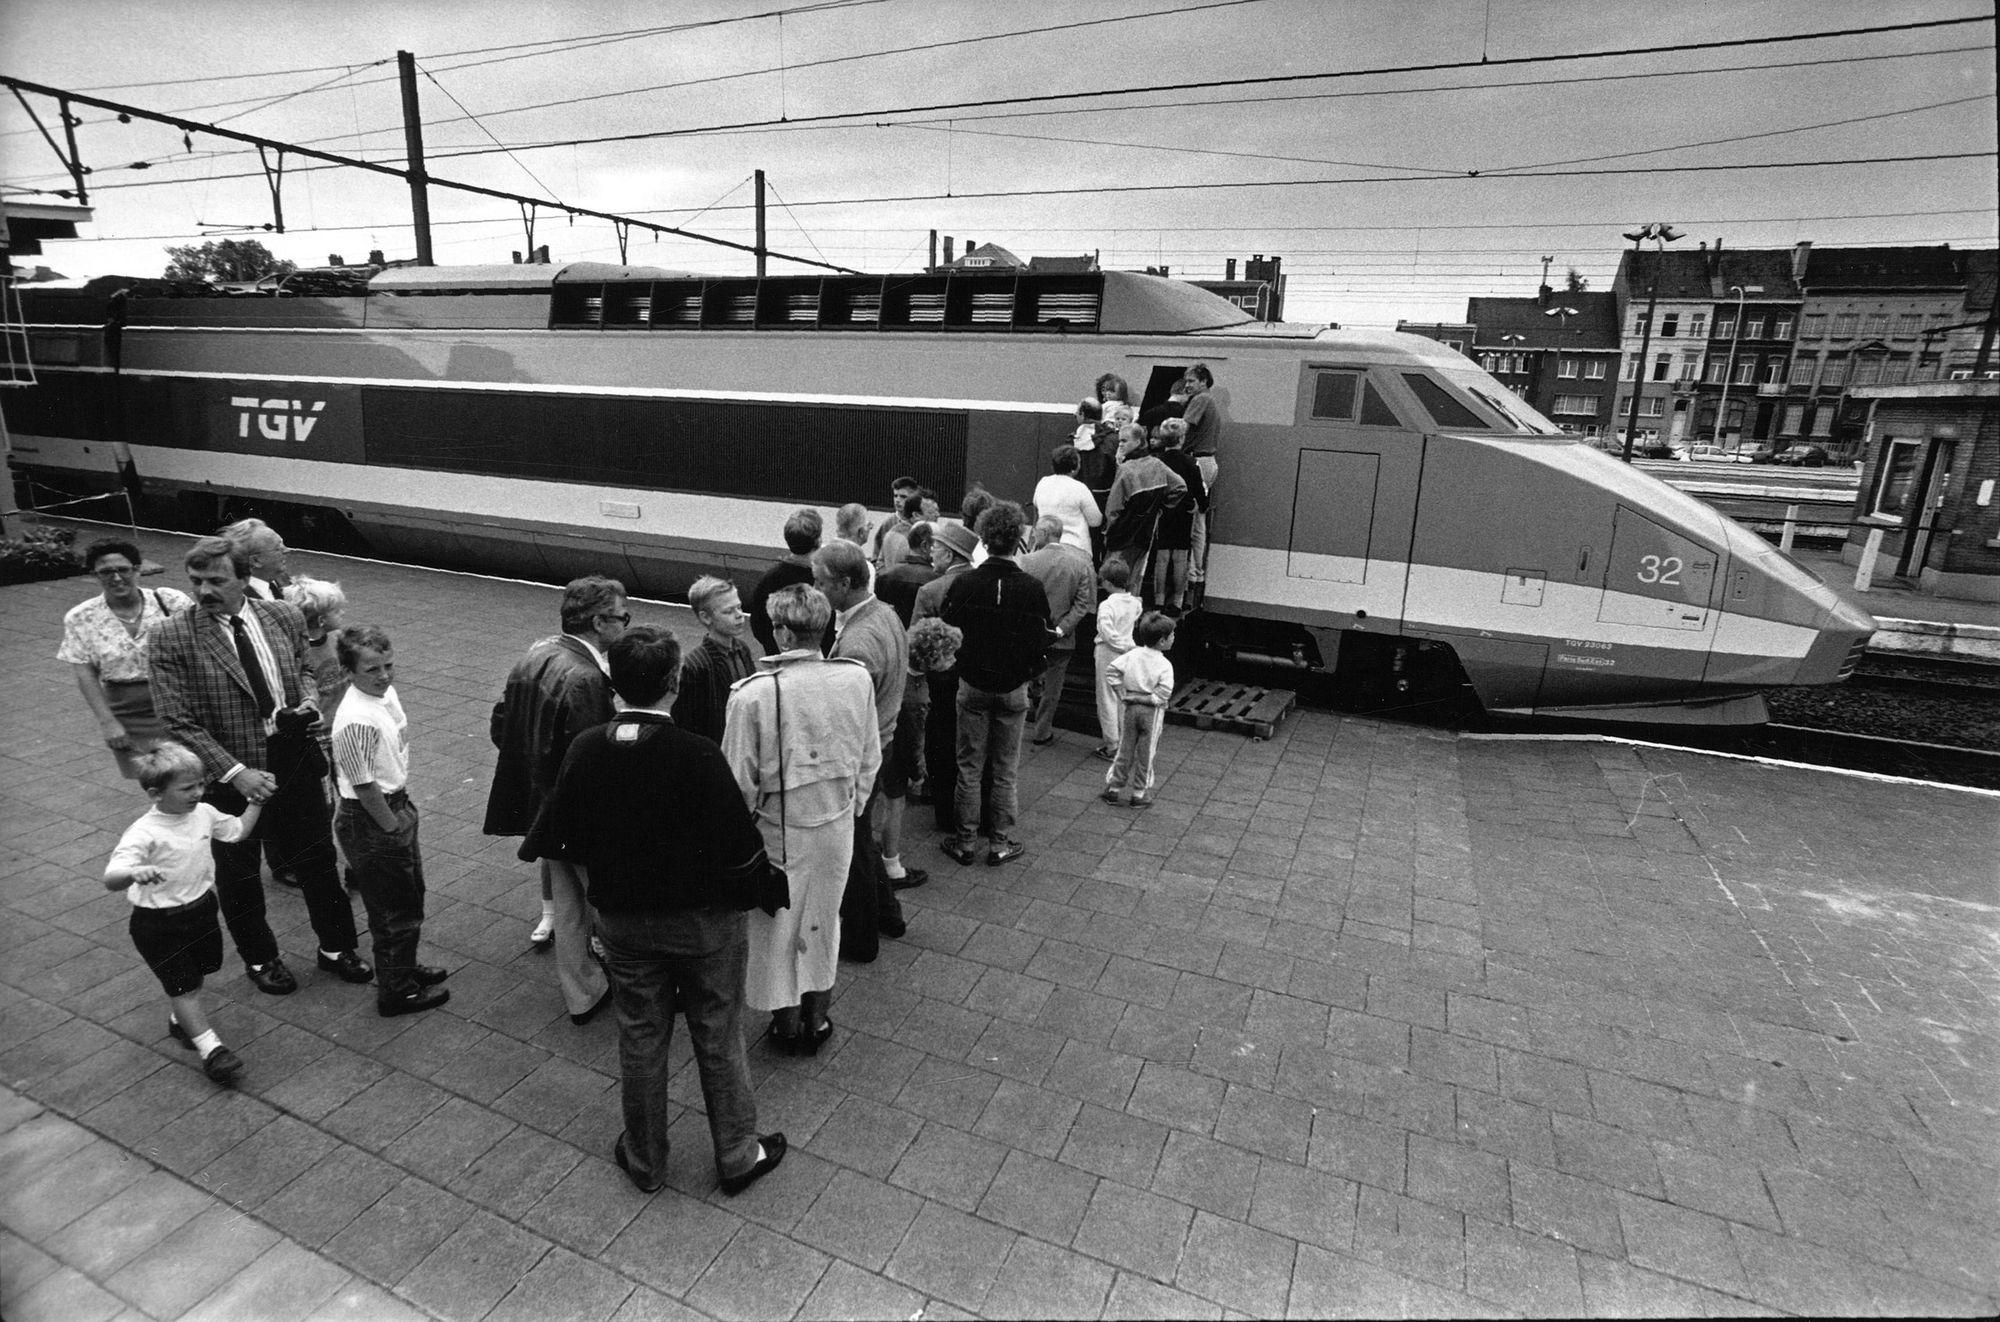 150 jaar spoorweg - TGV